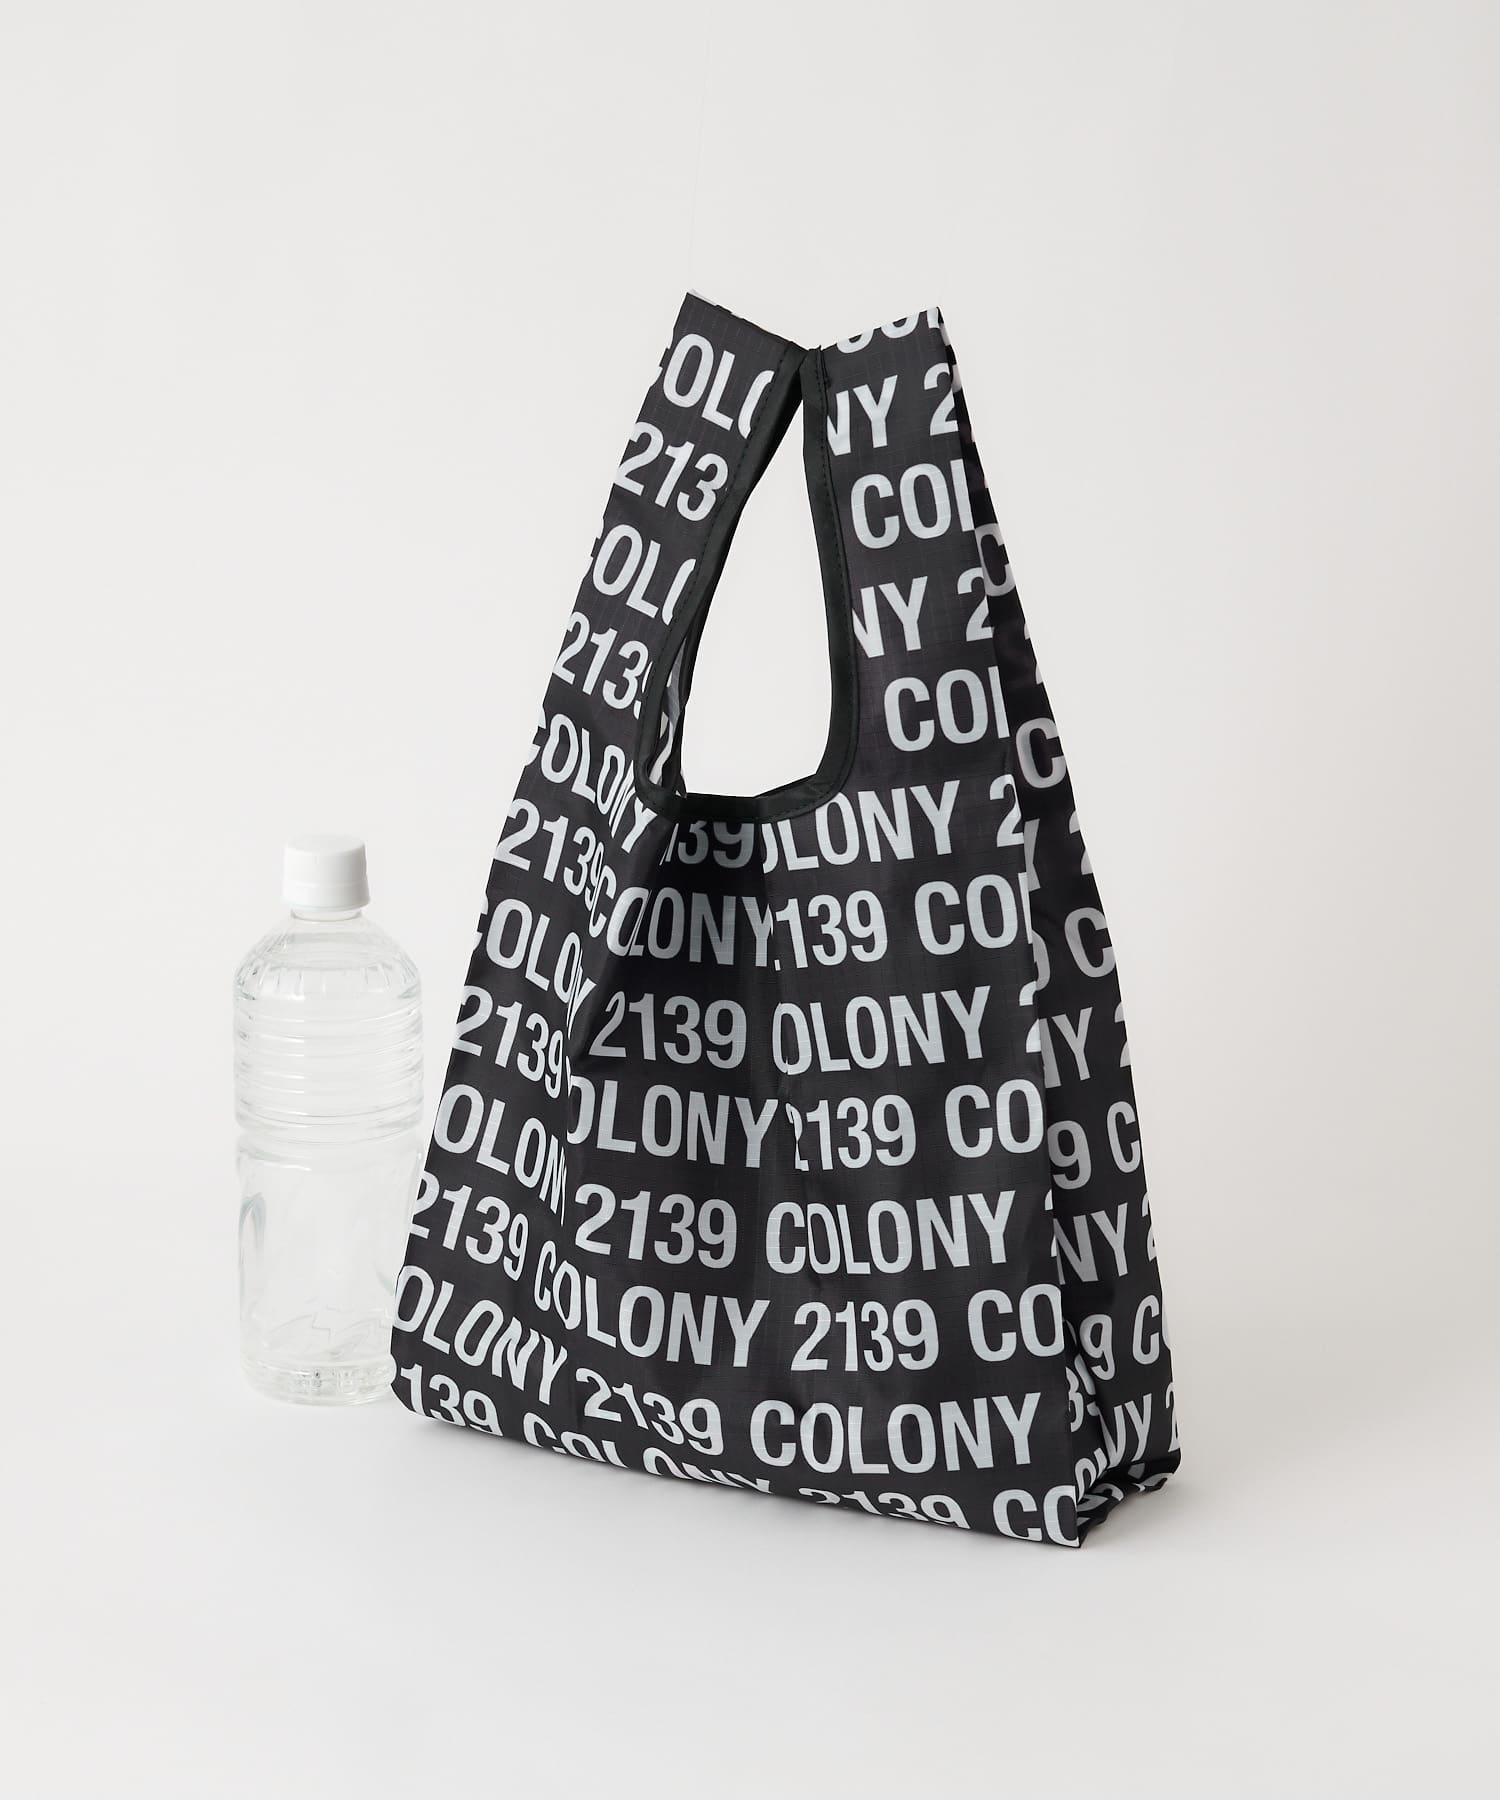 COLONY 2139(コロニー トゥーワンスリーナイン) レディース ミニショッパーエコバッグ ブラックその他2